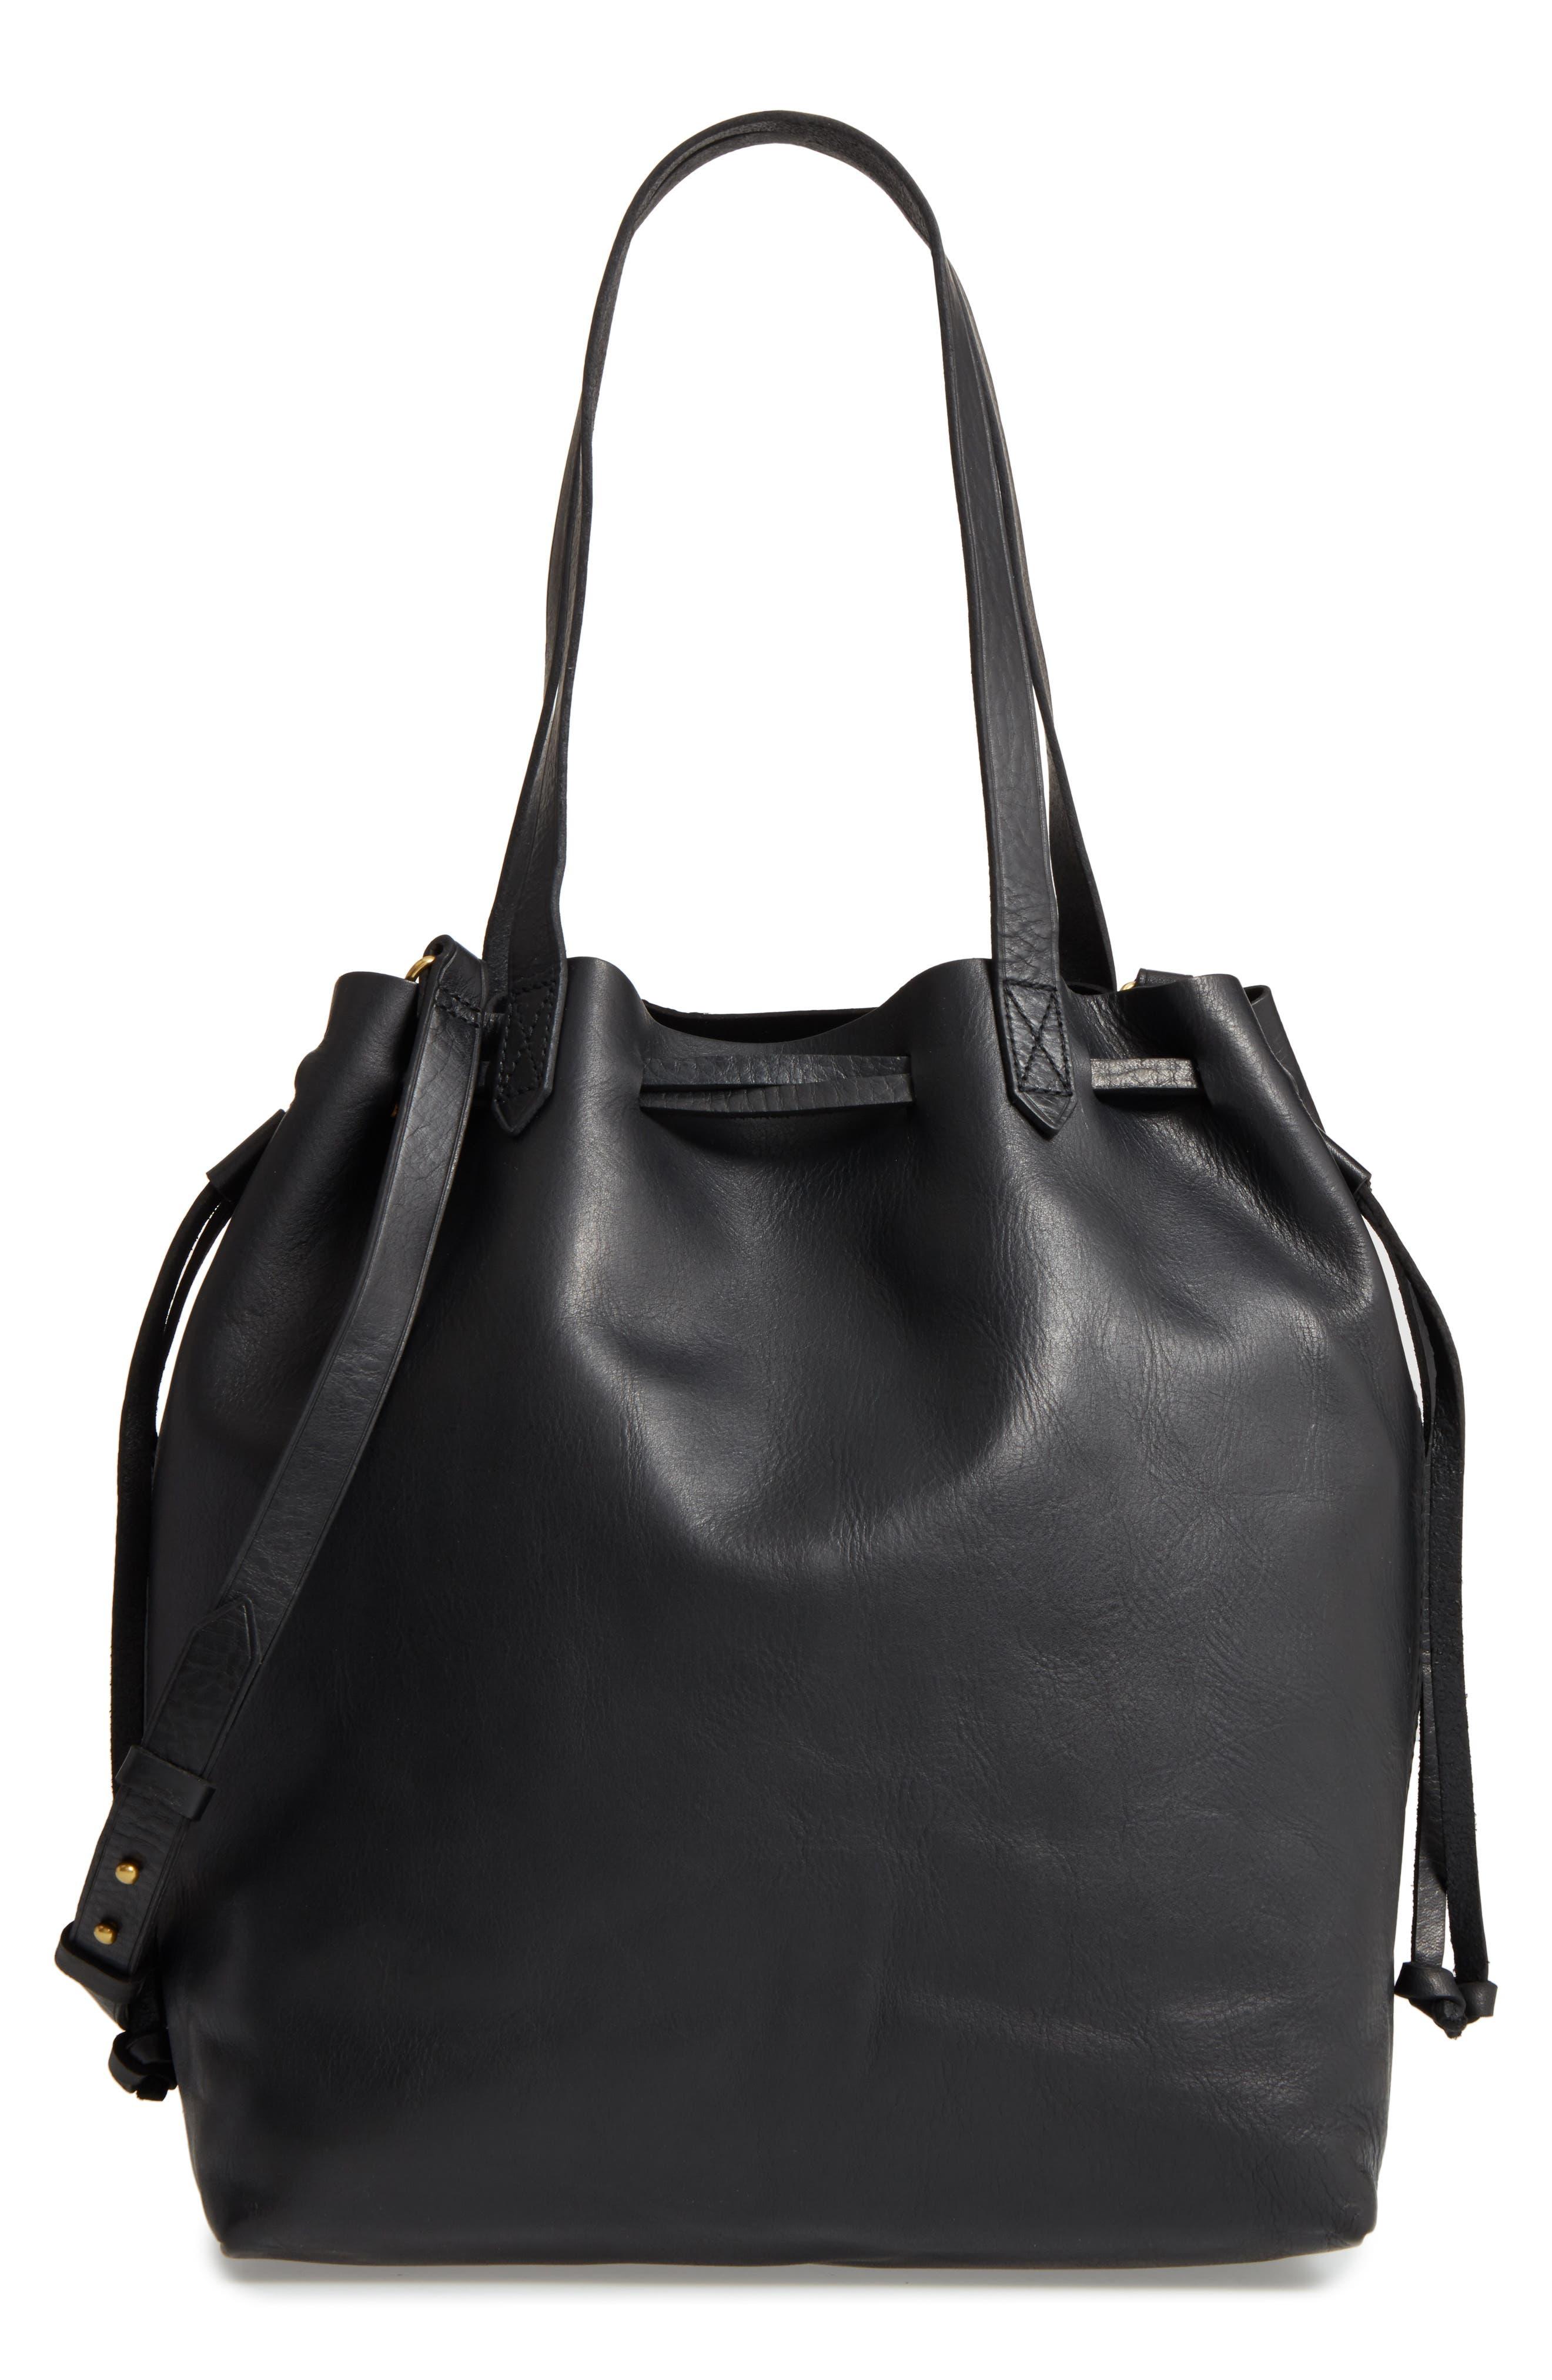 Madewell Medium Drawstring Transport Leather Tote - Black 659cb24f68f21